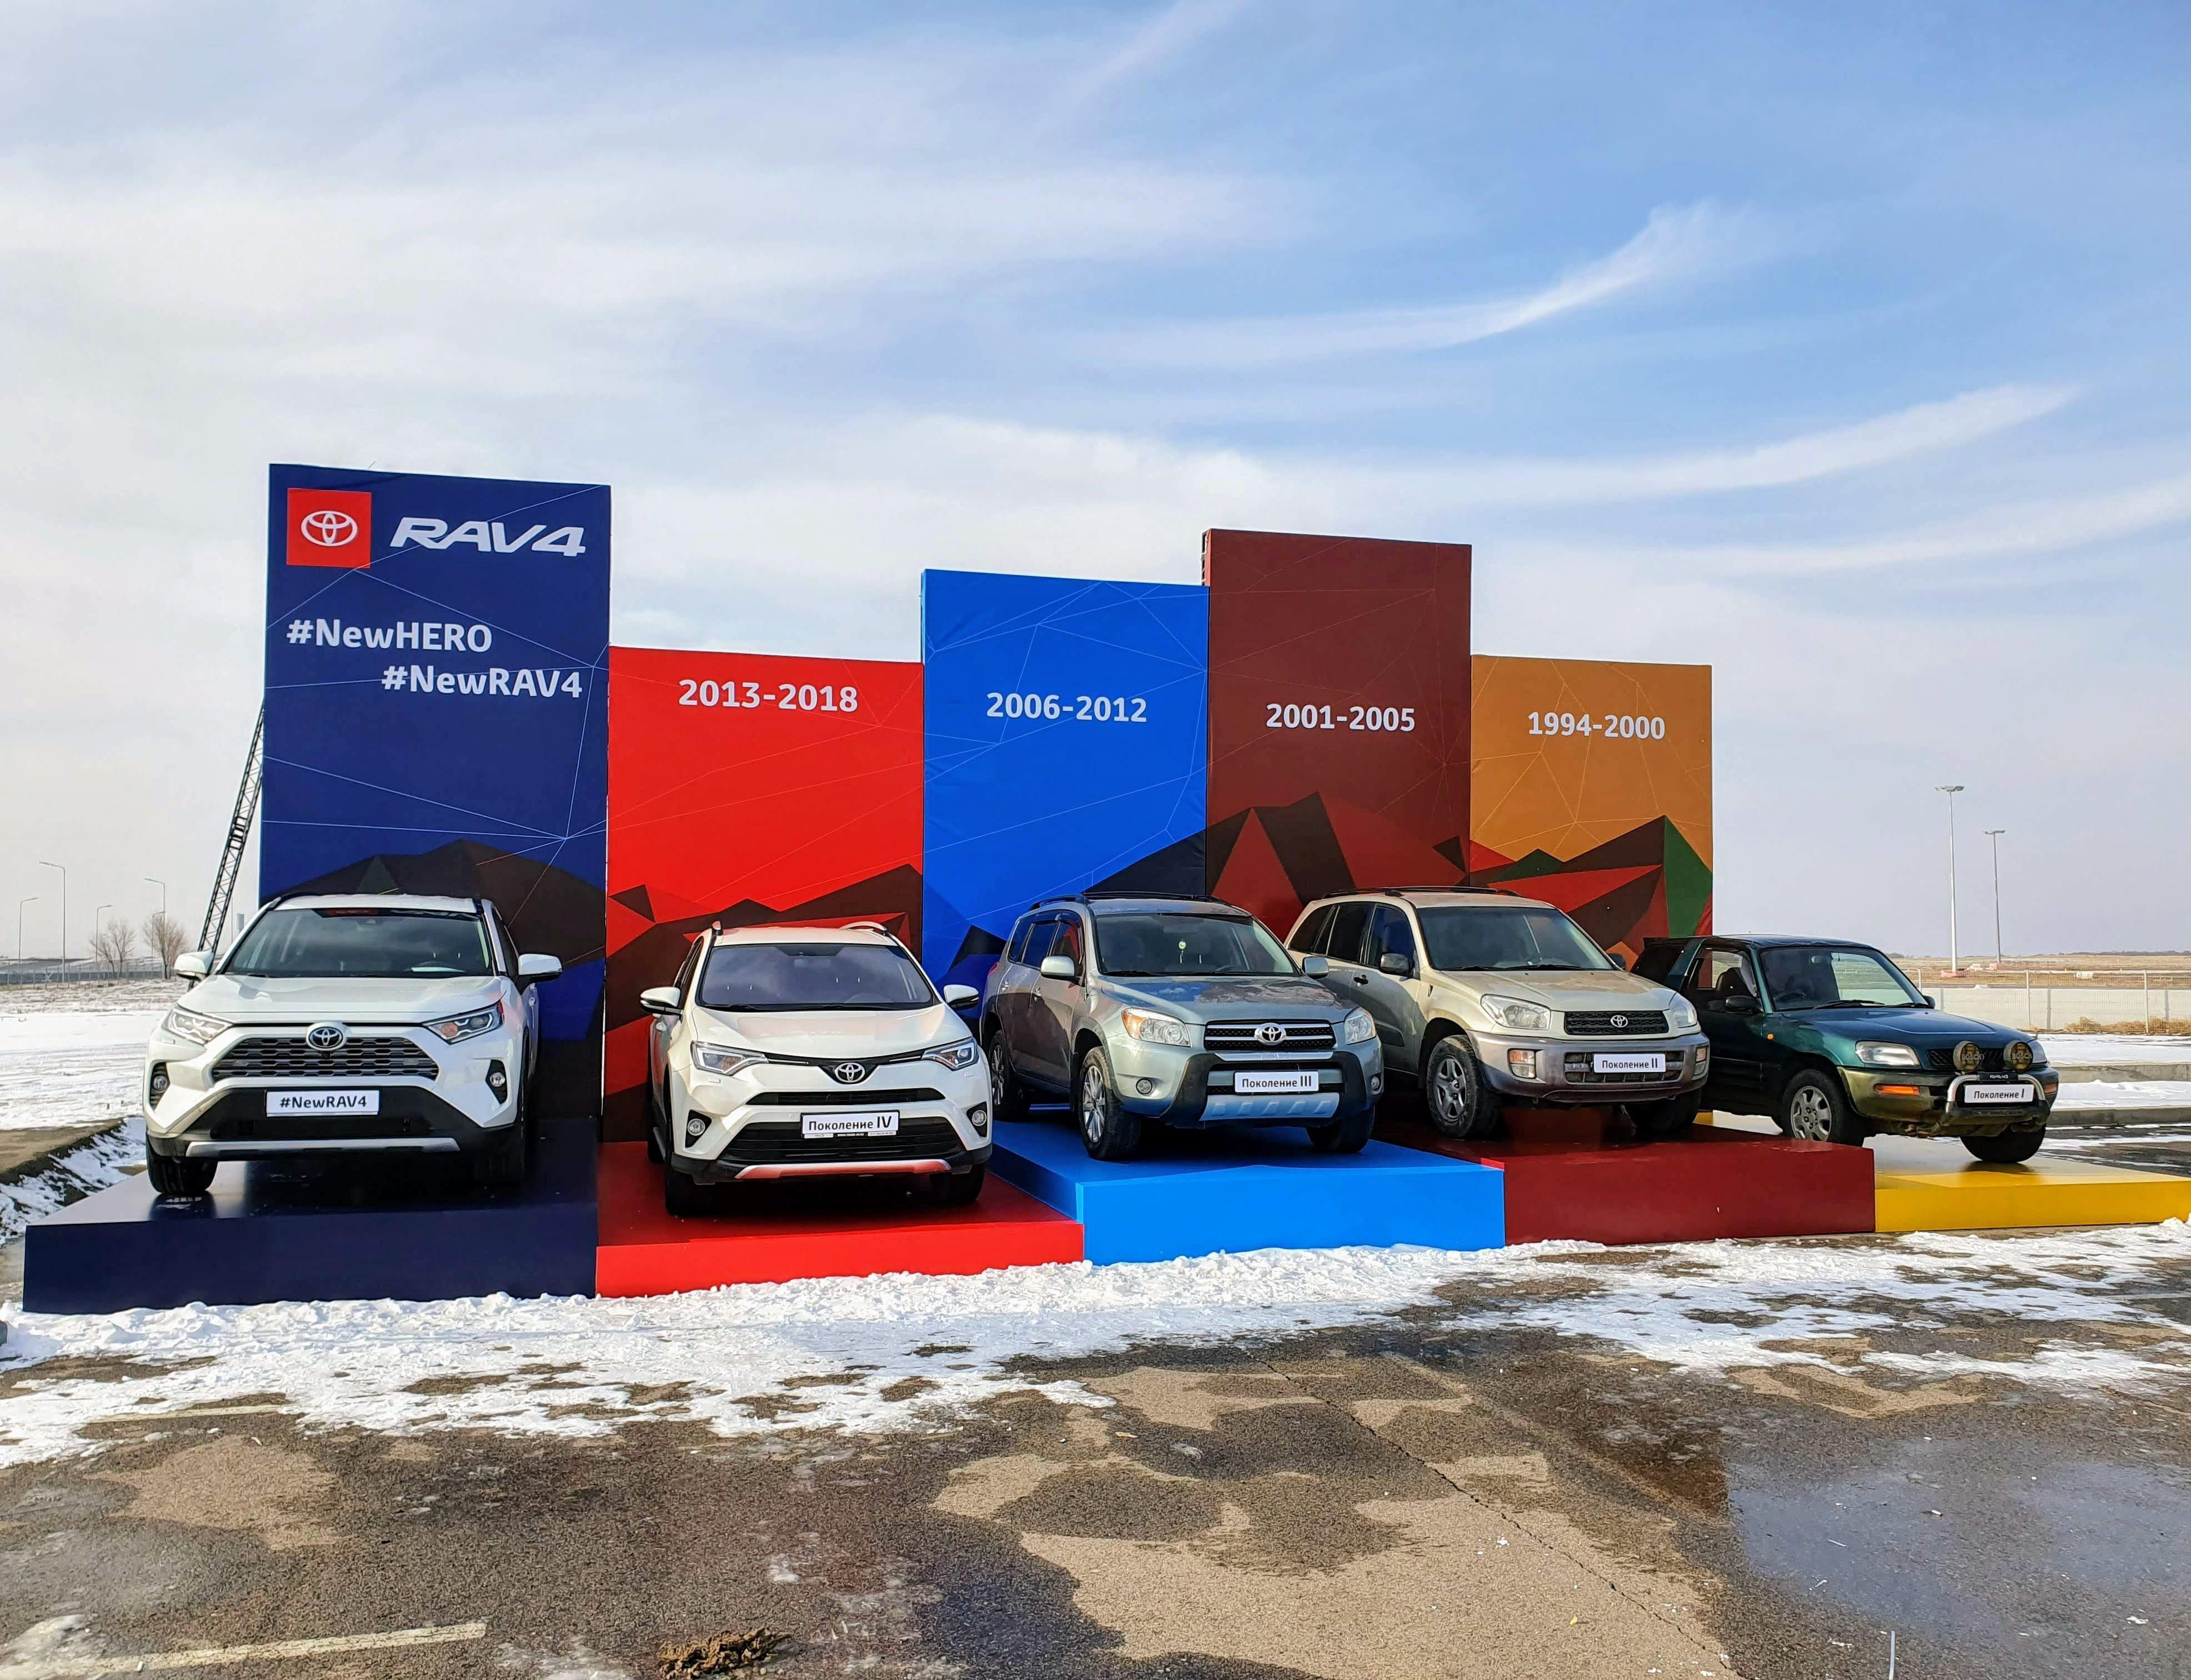 Итоги продаж в РК, юбилеи Veyron, RAV4 и Jimny 278498 - Kapital.kz